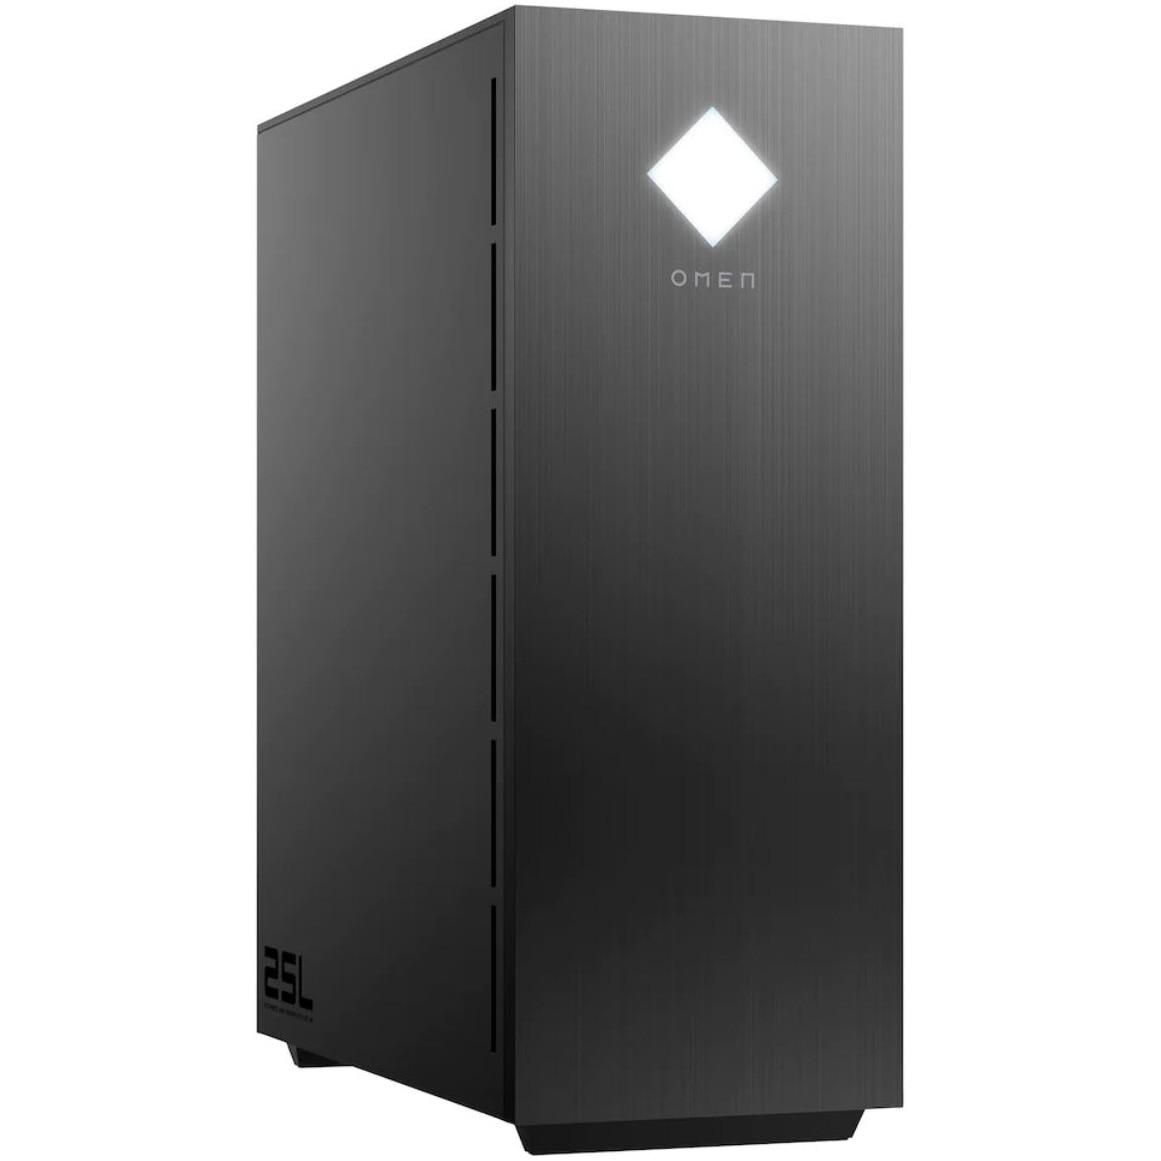 Fotografie Sistem Gaming OMEN by HP GT11-1000nq cu procesor AMD Ryzen™ 7 5700G pana la 4.60 GHz, 16GB DDR4, 512GB SSD, NVIDIA GeForce RTX 3060 12GB, Free DOS, Black